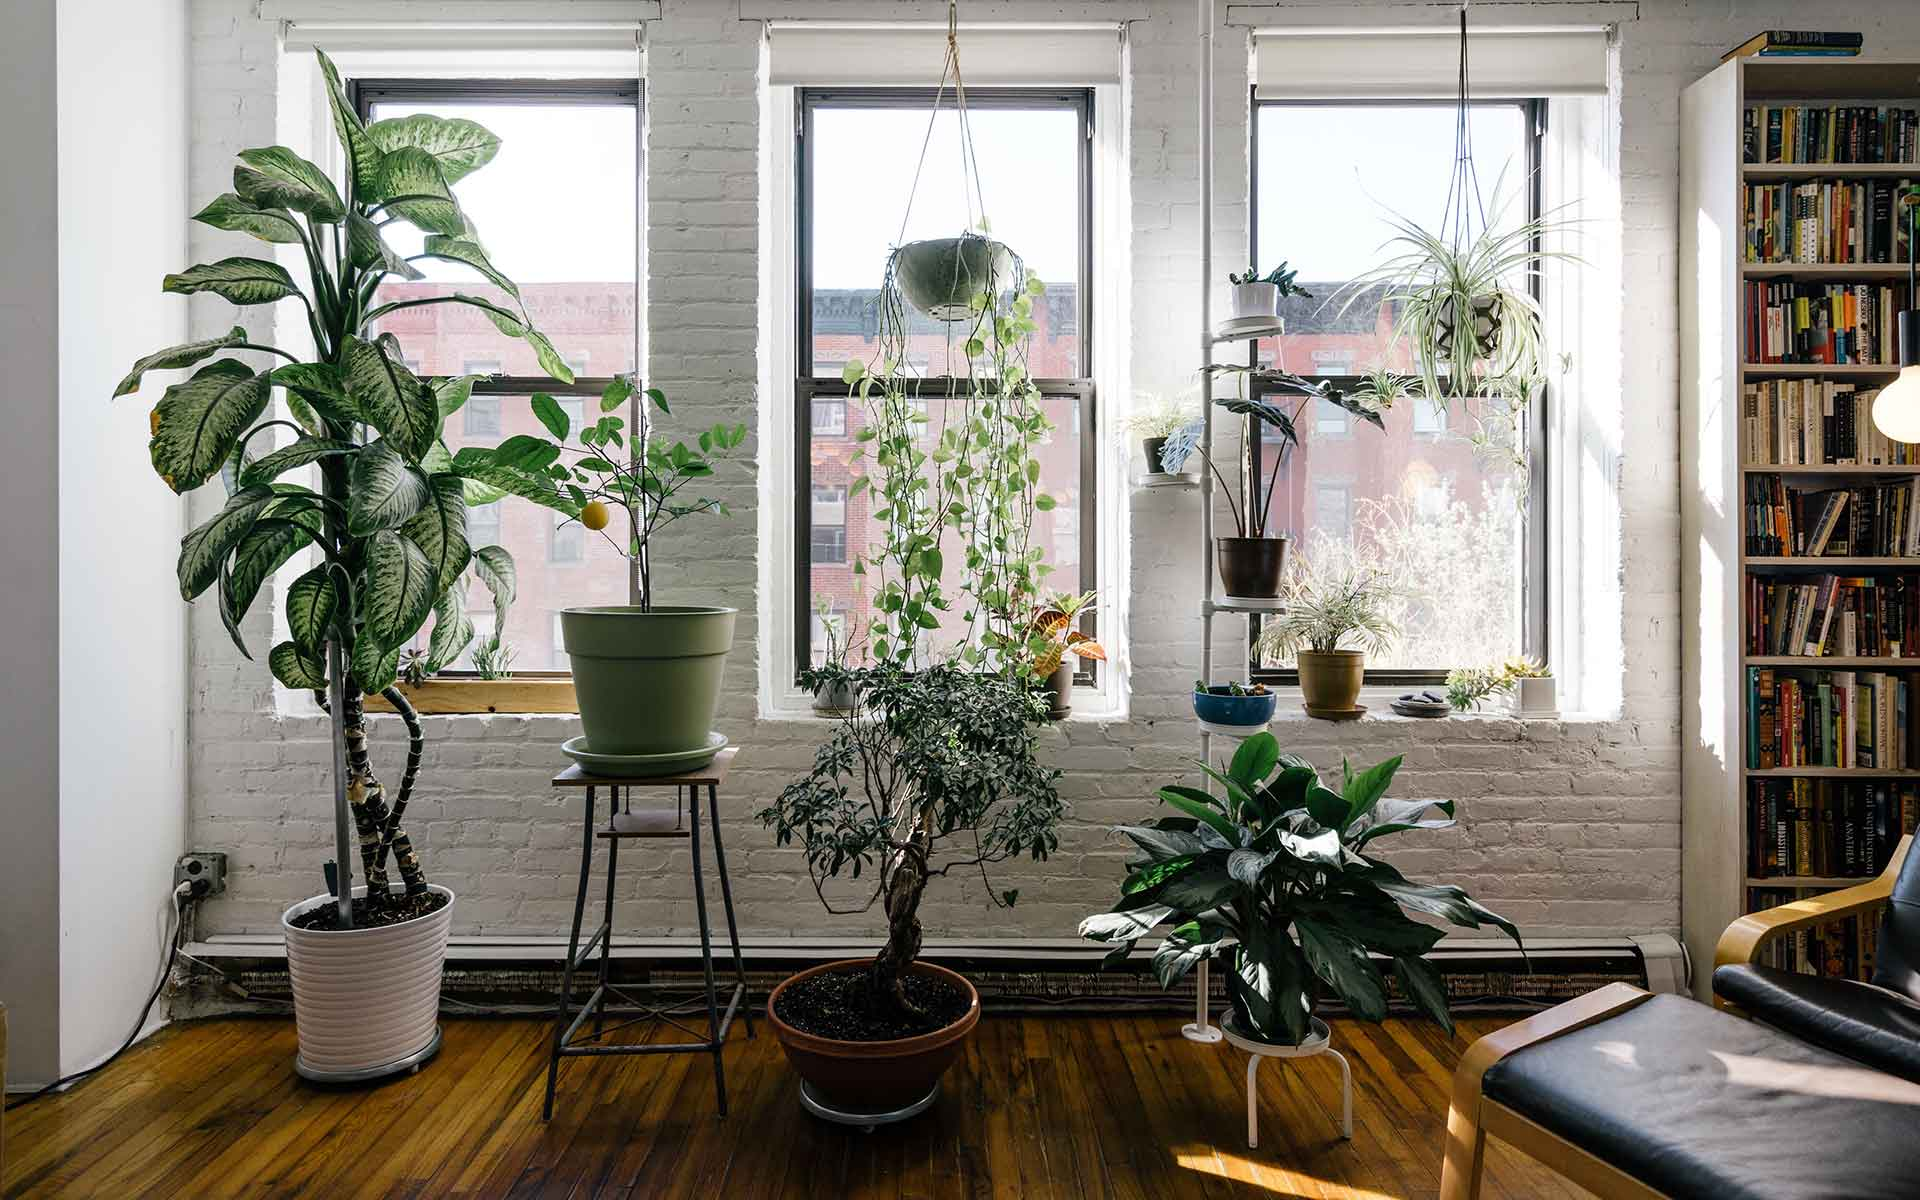 Planting an indoor garden during quarantine